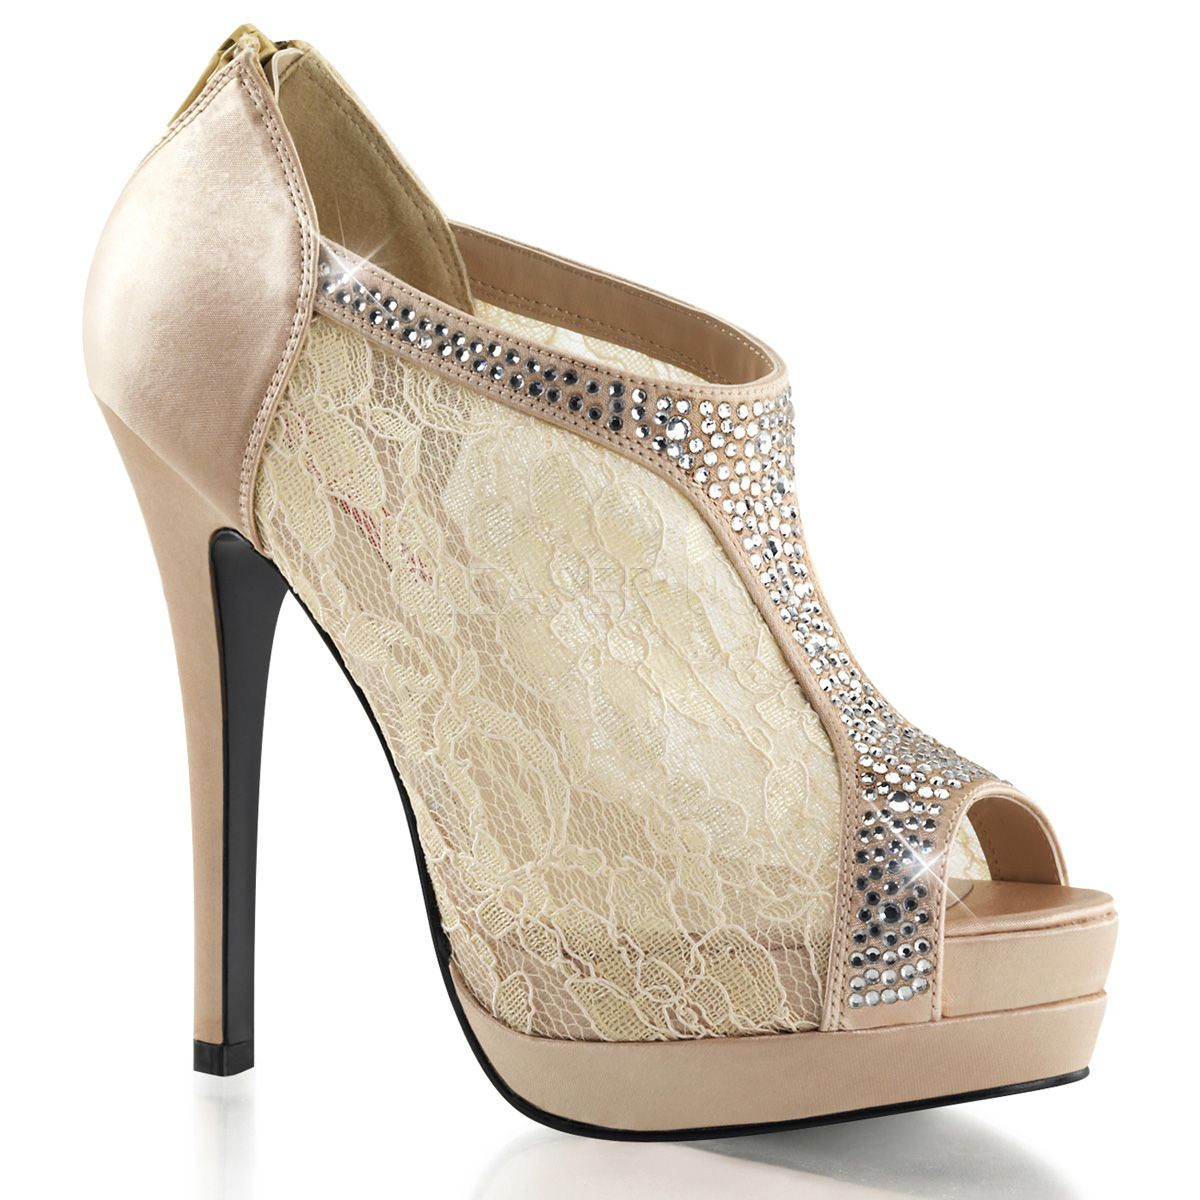 Lace embellished bridal bootie PLEASER Schuhe  BELLA 26    26 Schuhe ... 55a08c